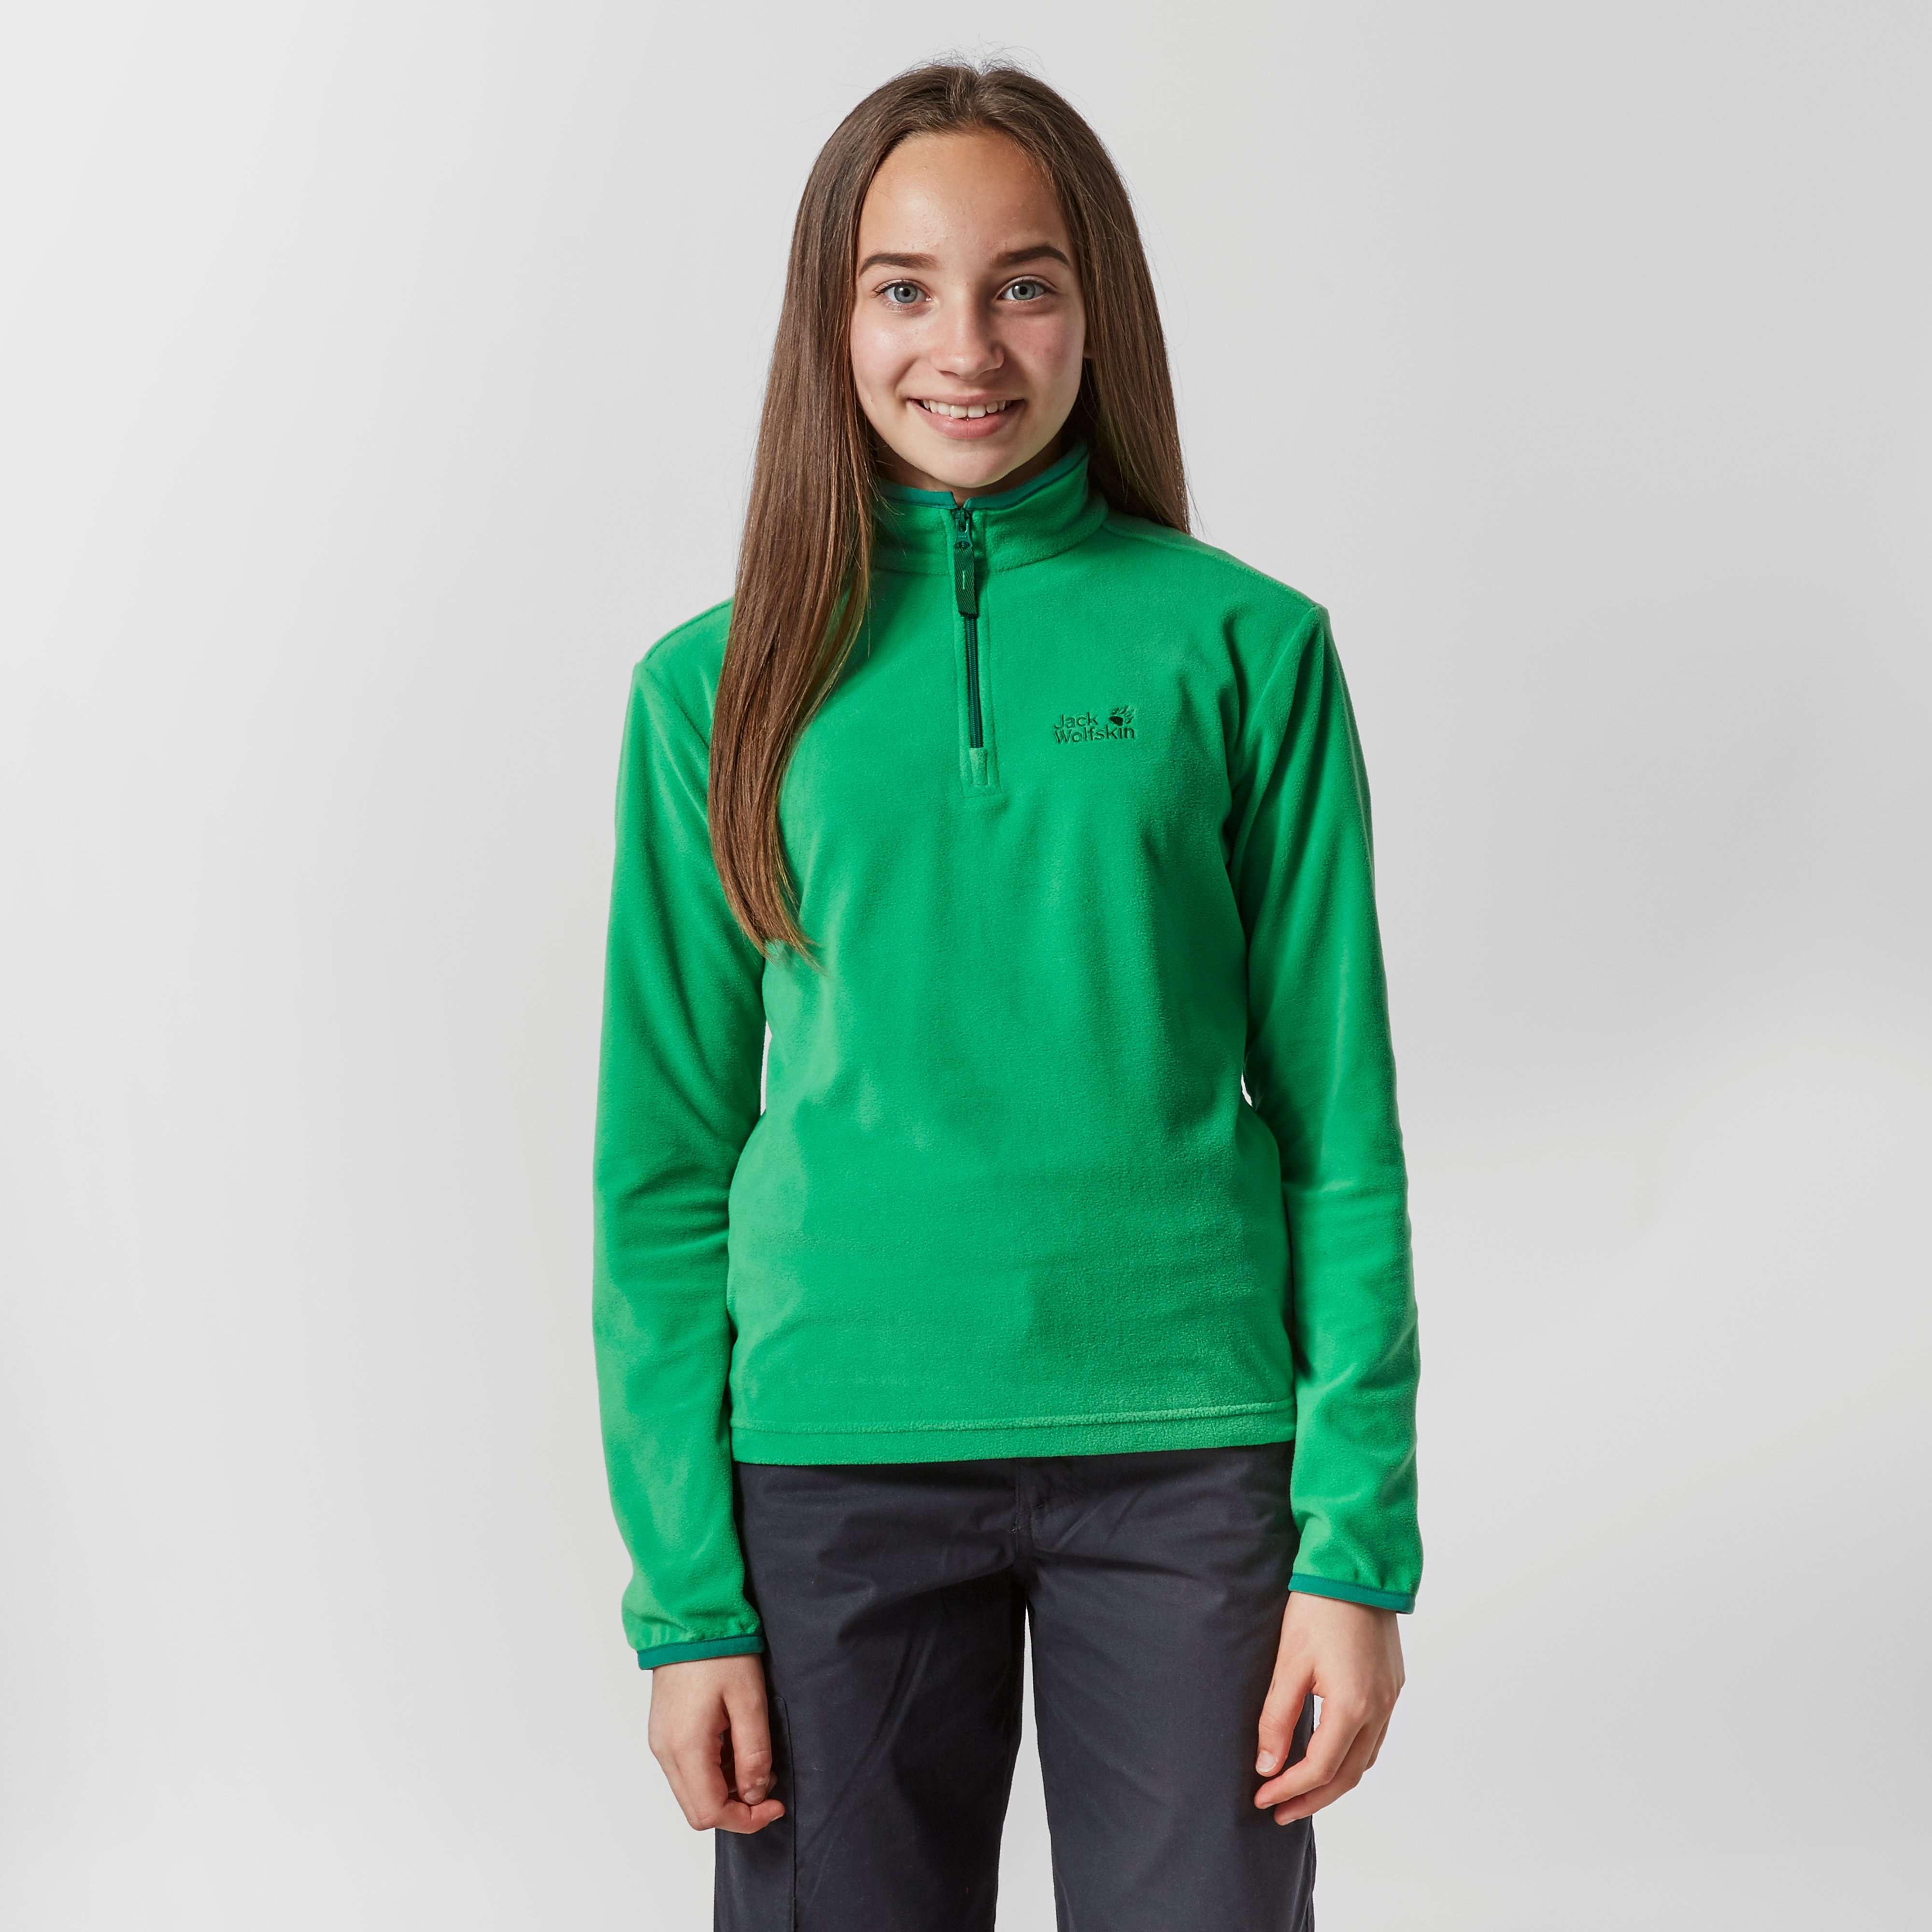 JACK WOLFSKIN Girl's Gecko Half Zip Fleece